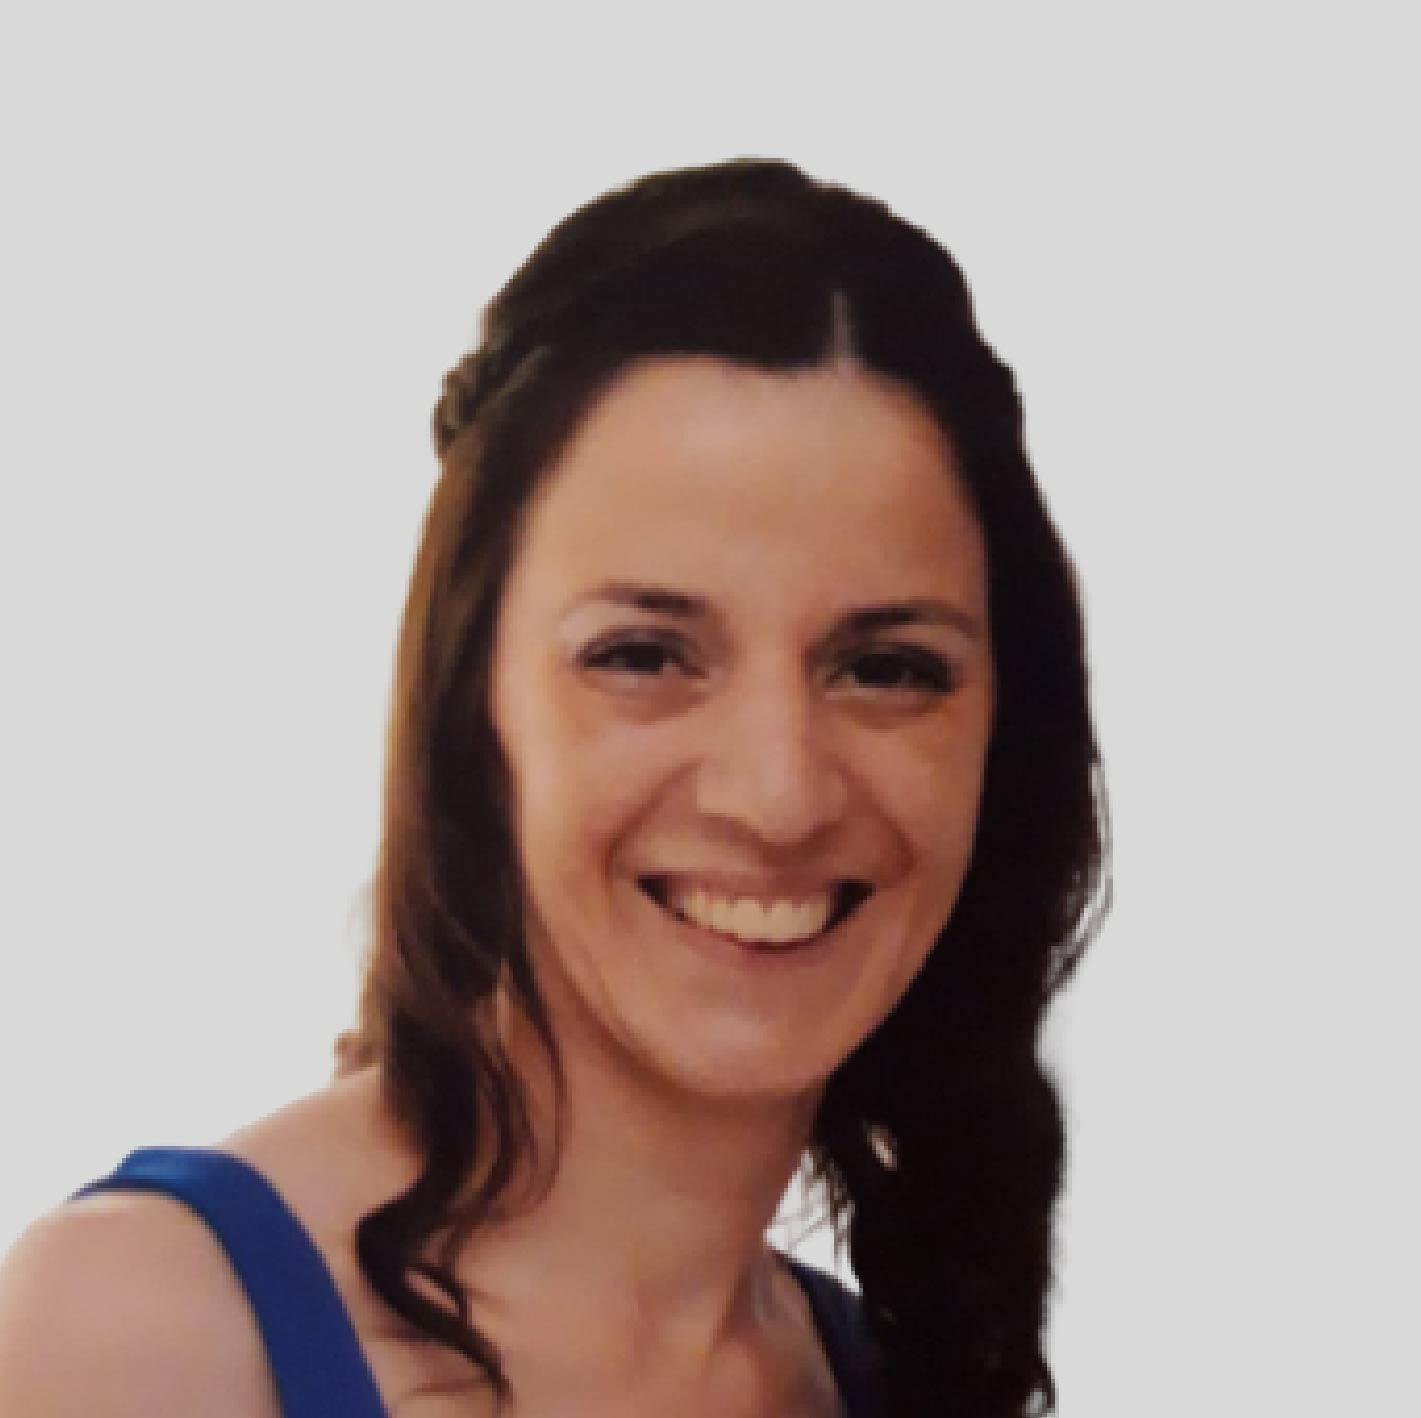 Kátia Machado